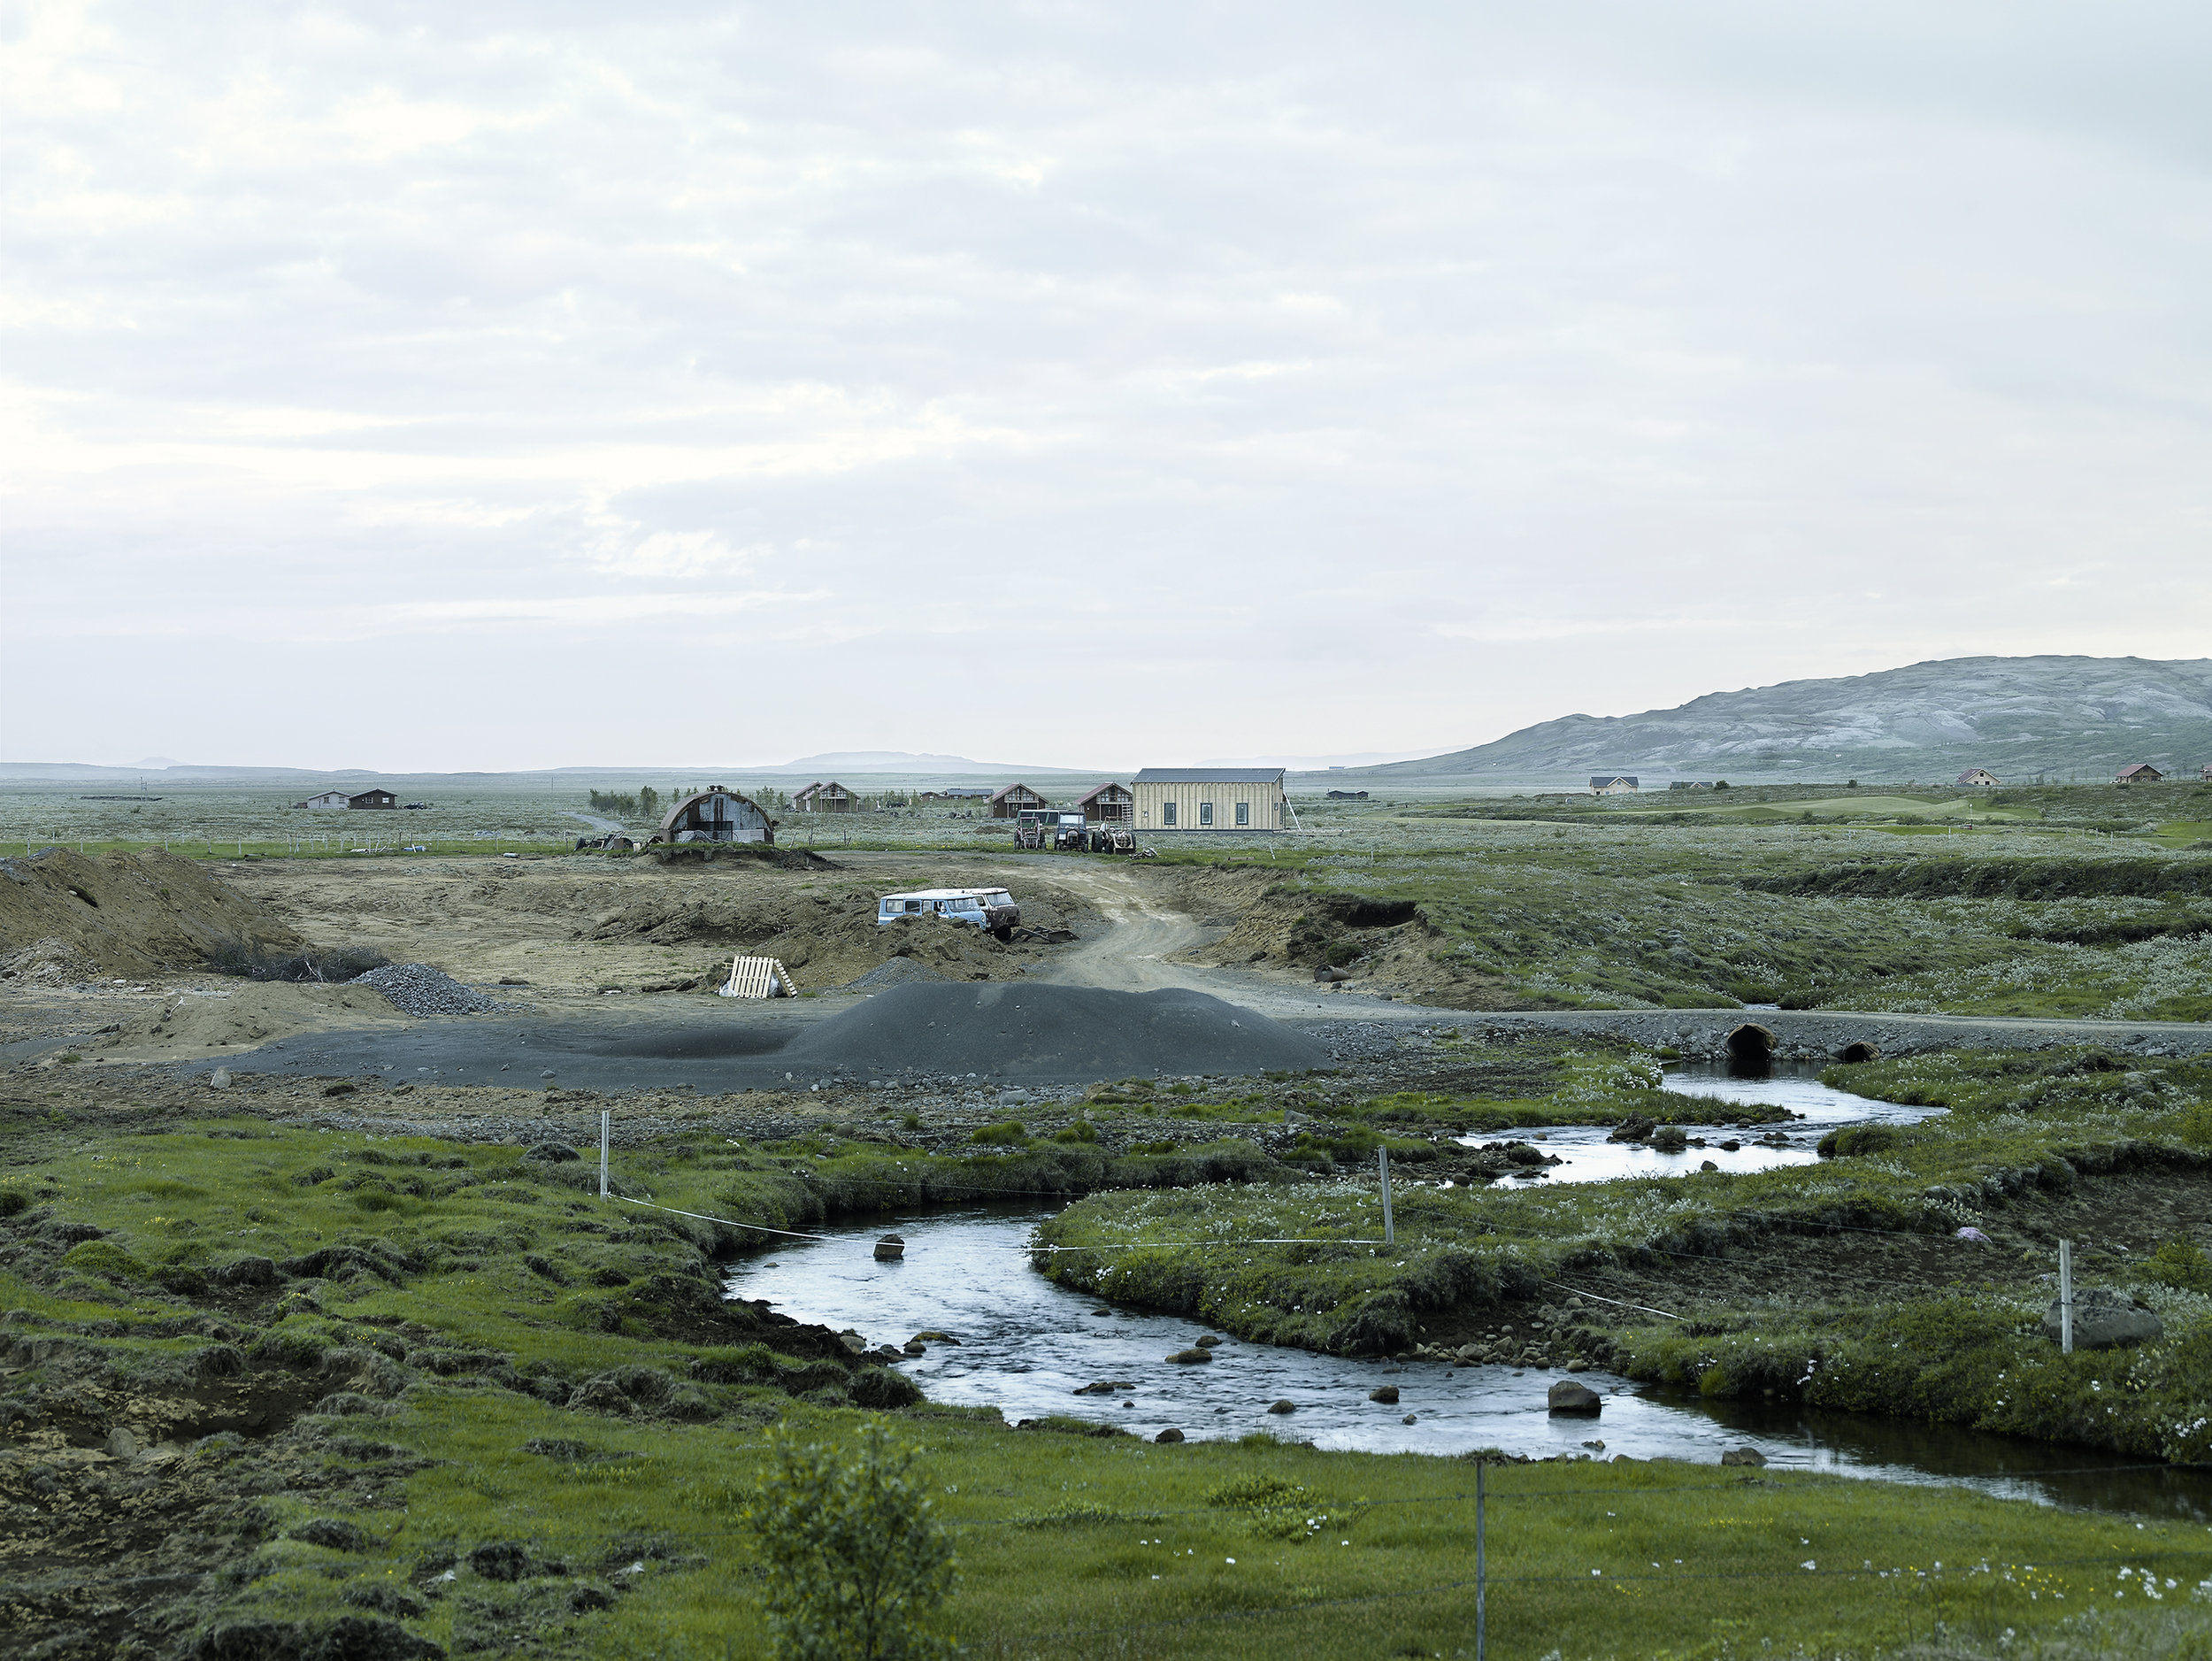 Farm, Islande, 2007.